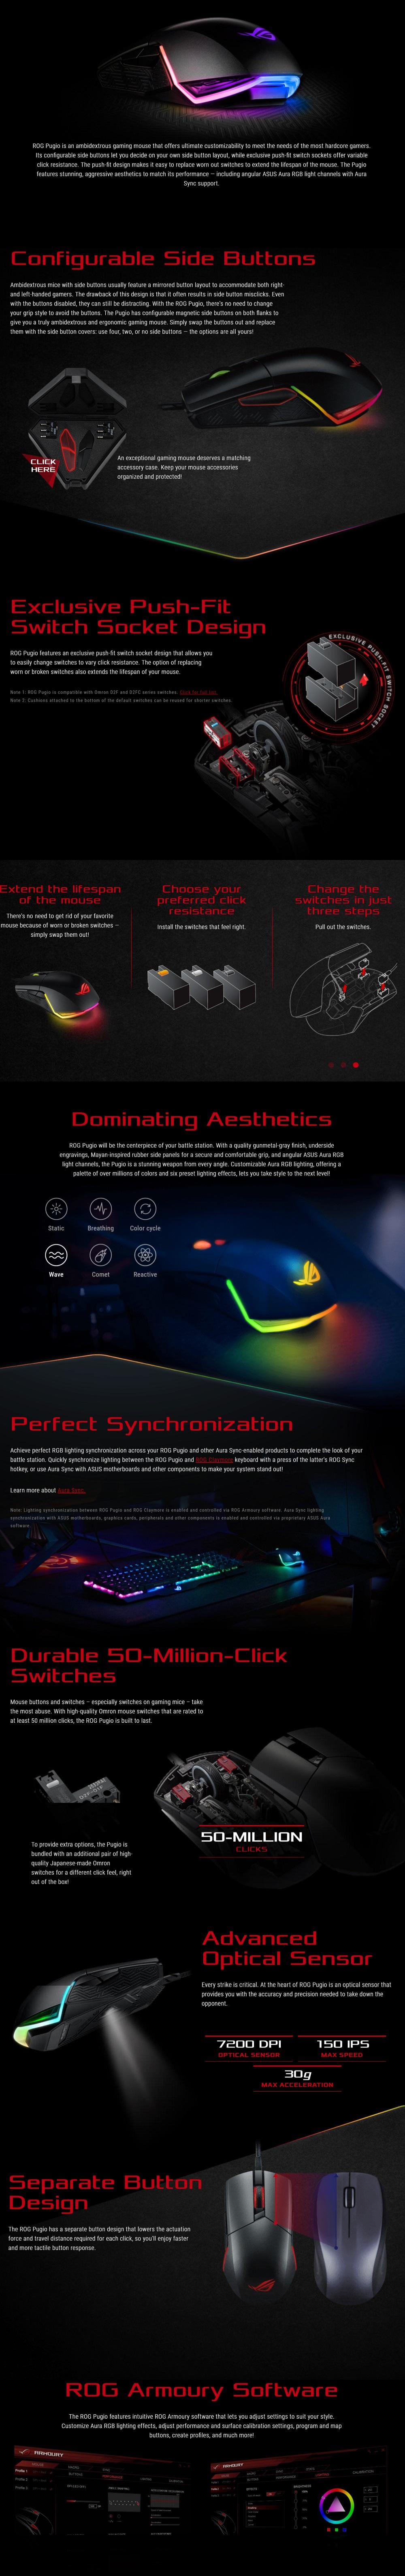 Asus ROG Pugio Aura [7 2K] DPI Gaming Mouse